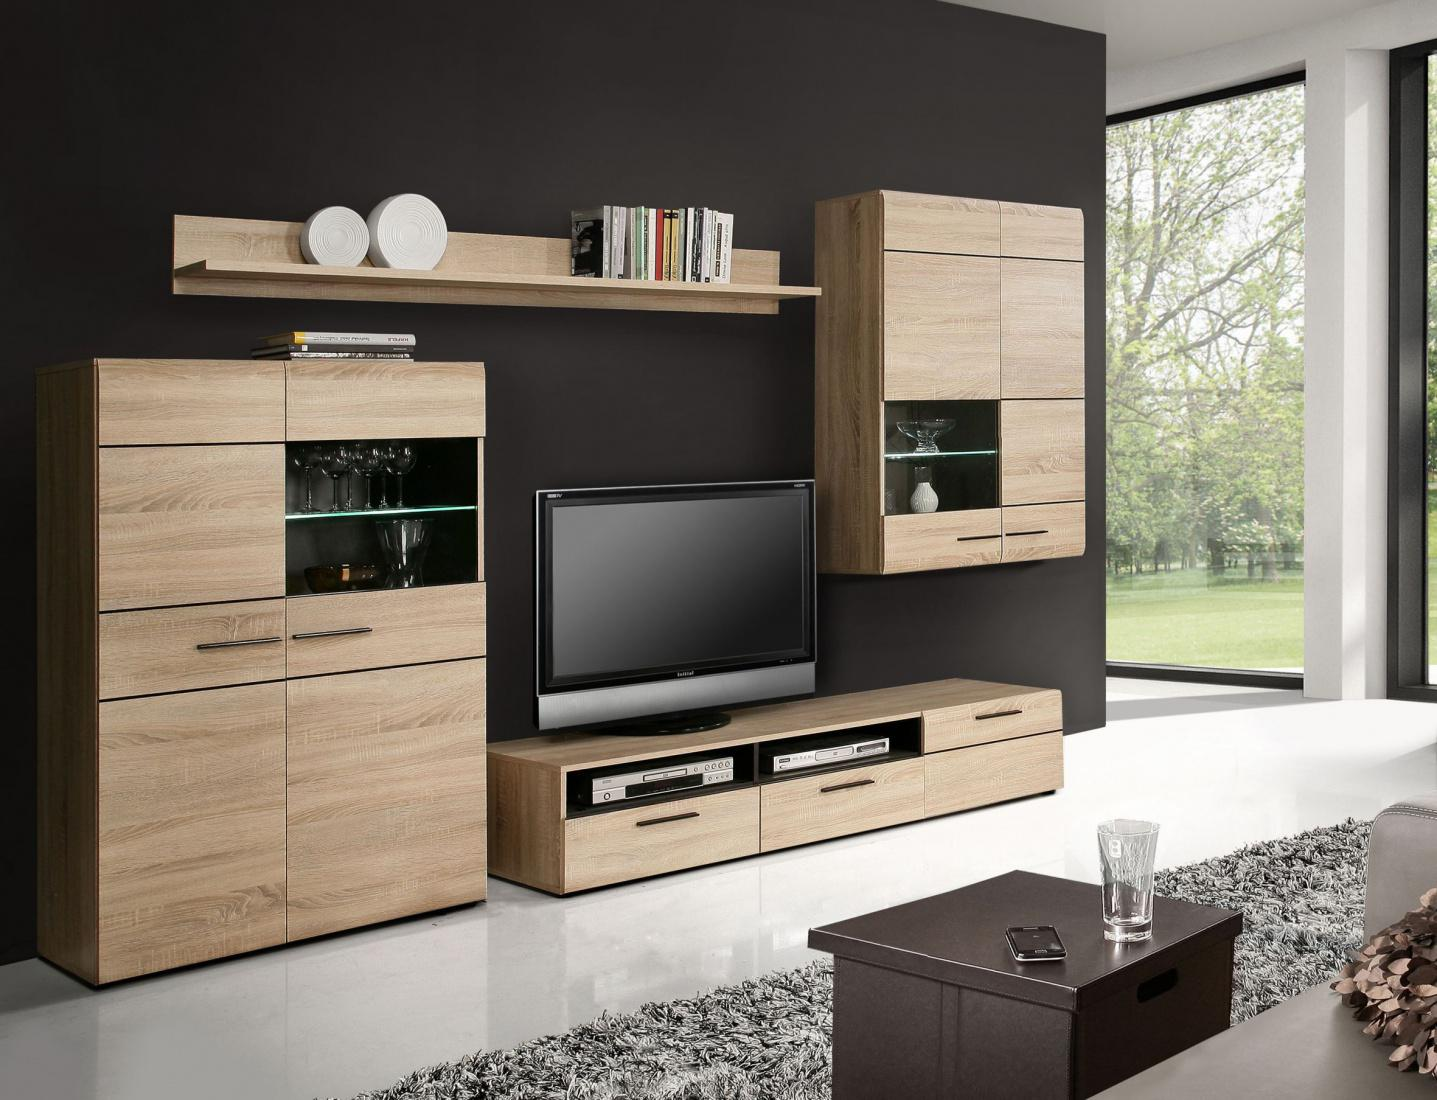 wohnwand sarah 4 tlg in sonoma eiche denver eiche. Black Bedroom Furniture Sets. Home Design Ideas